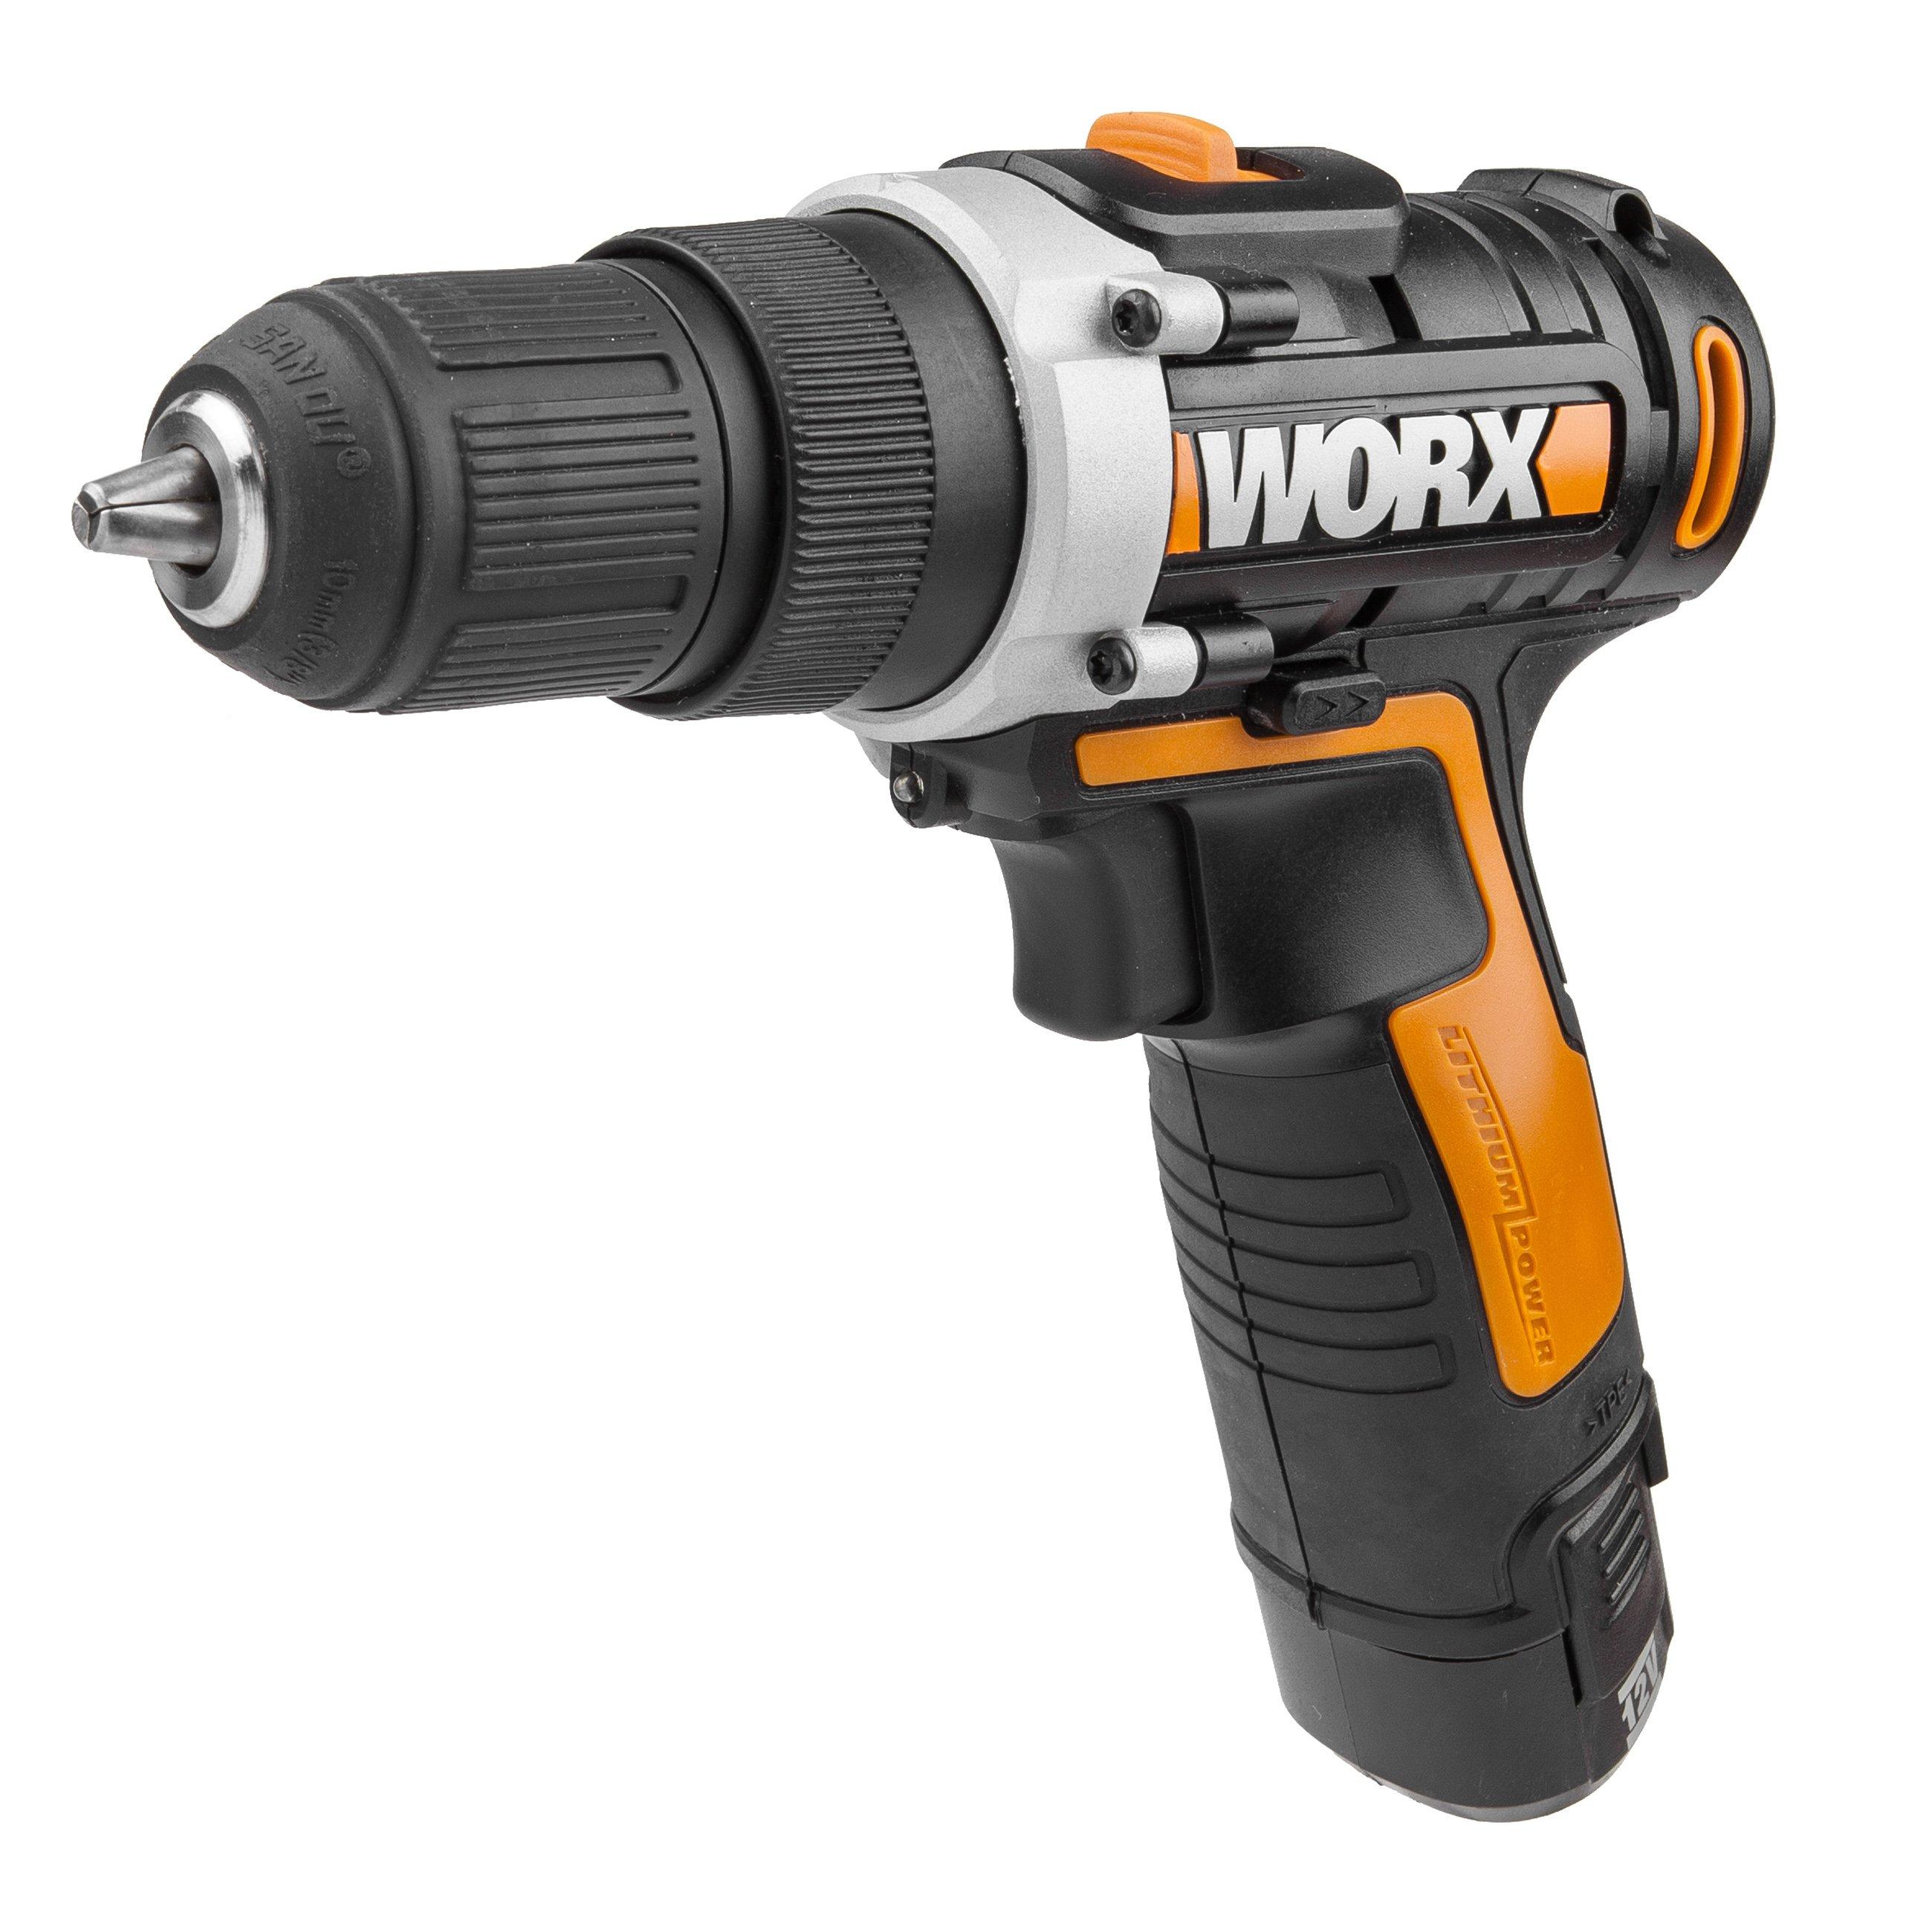 Worx WX128 12 V Akku-Bohrschrauber